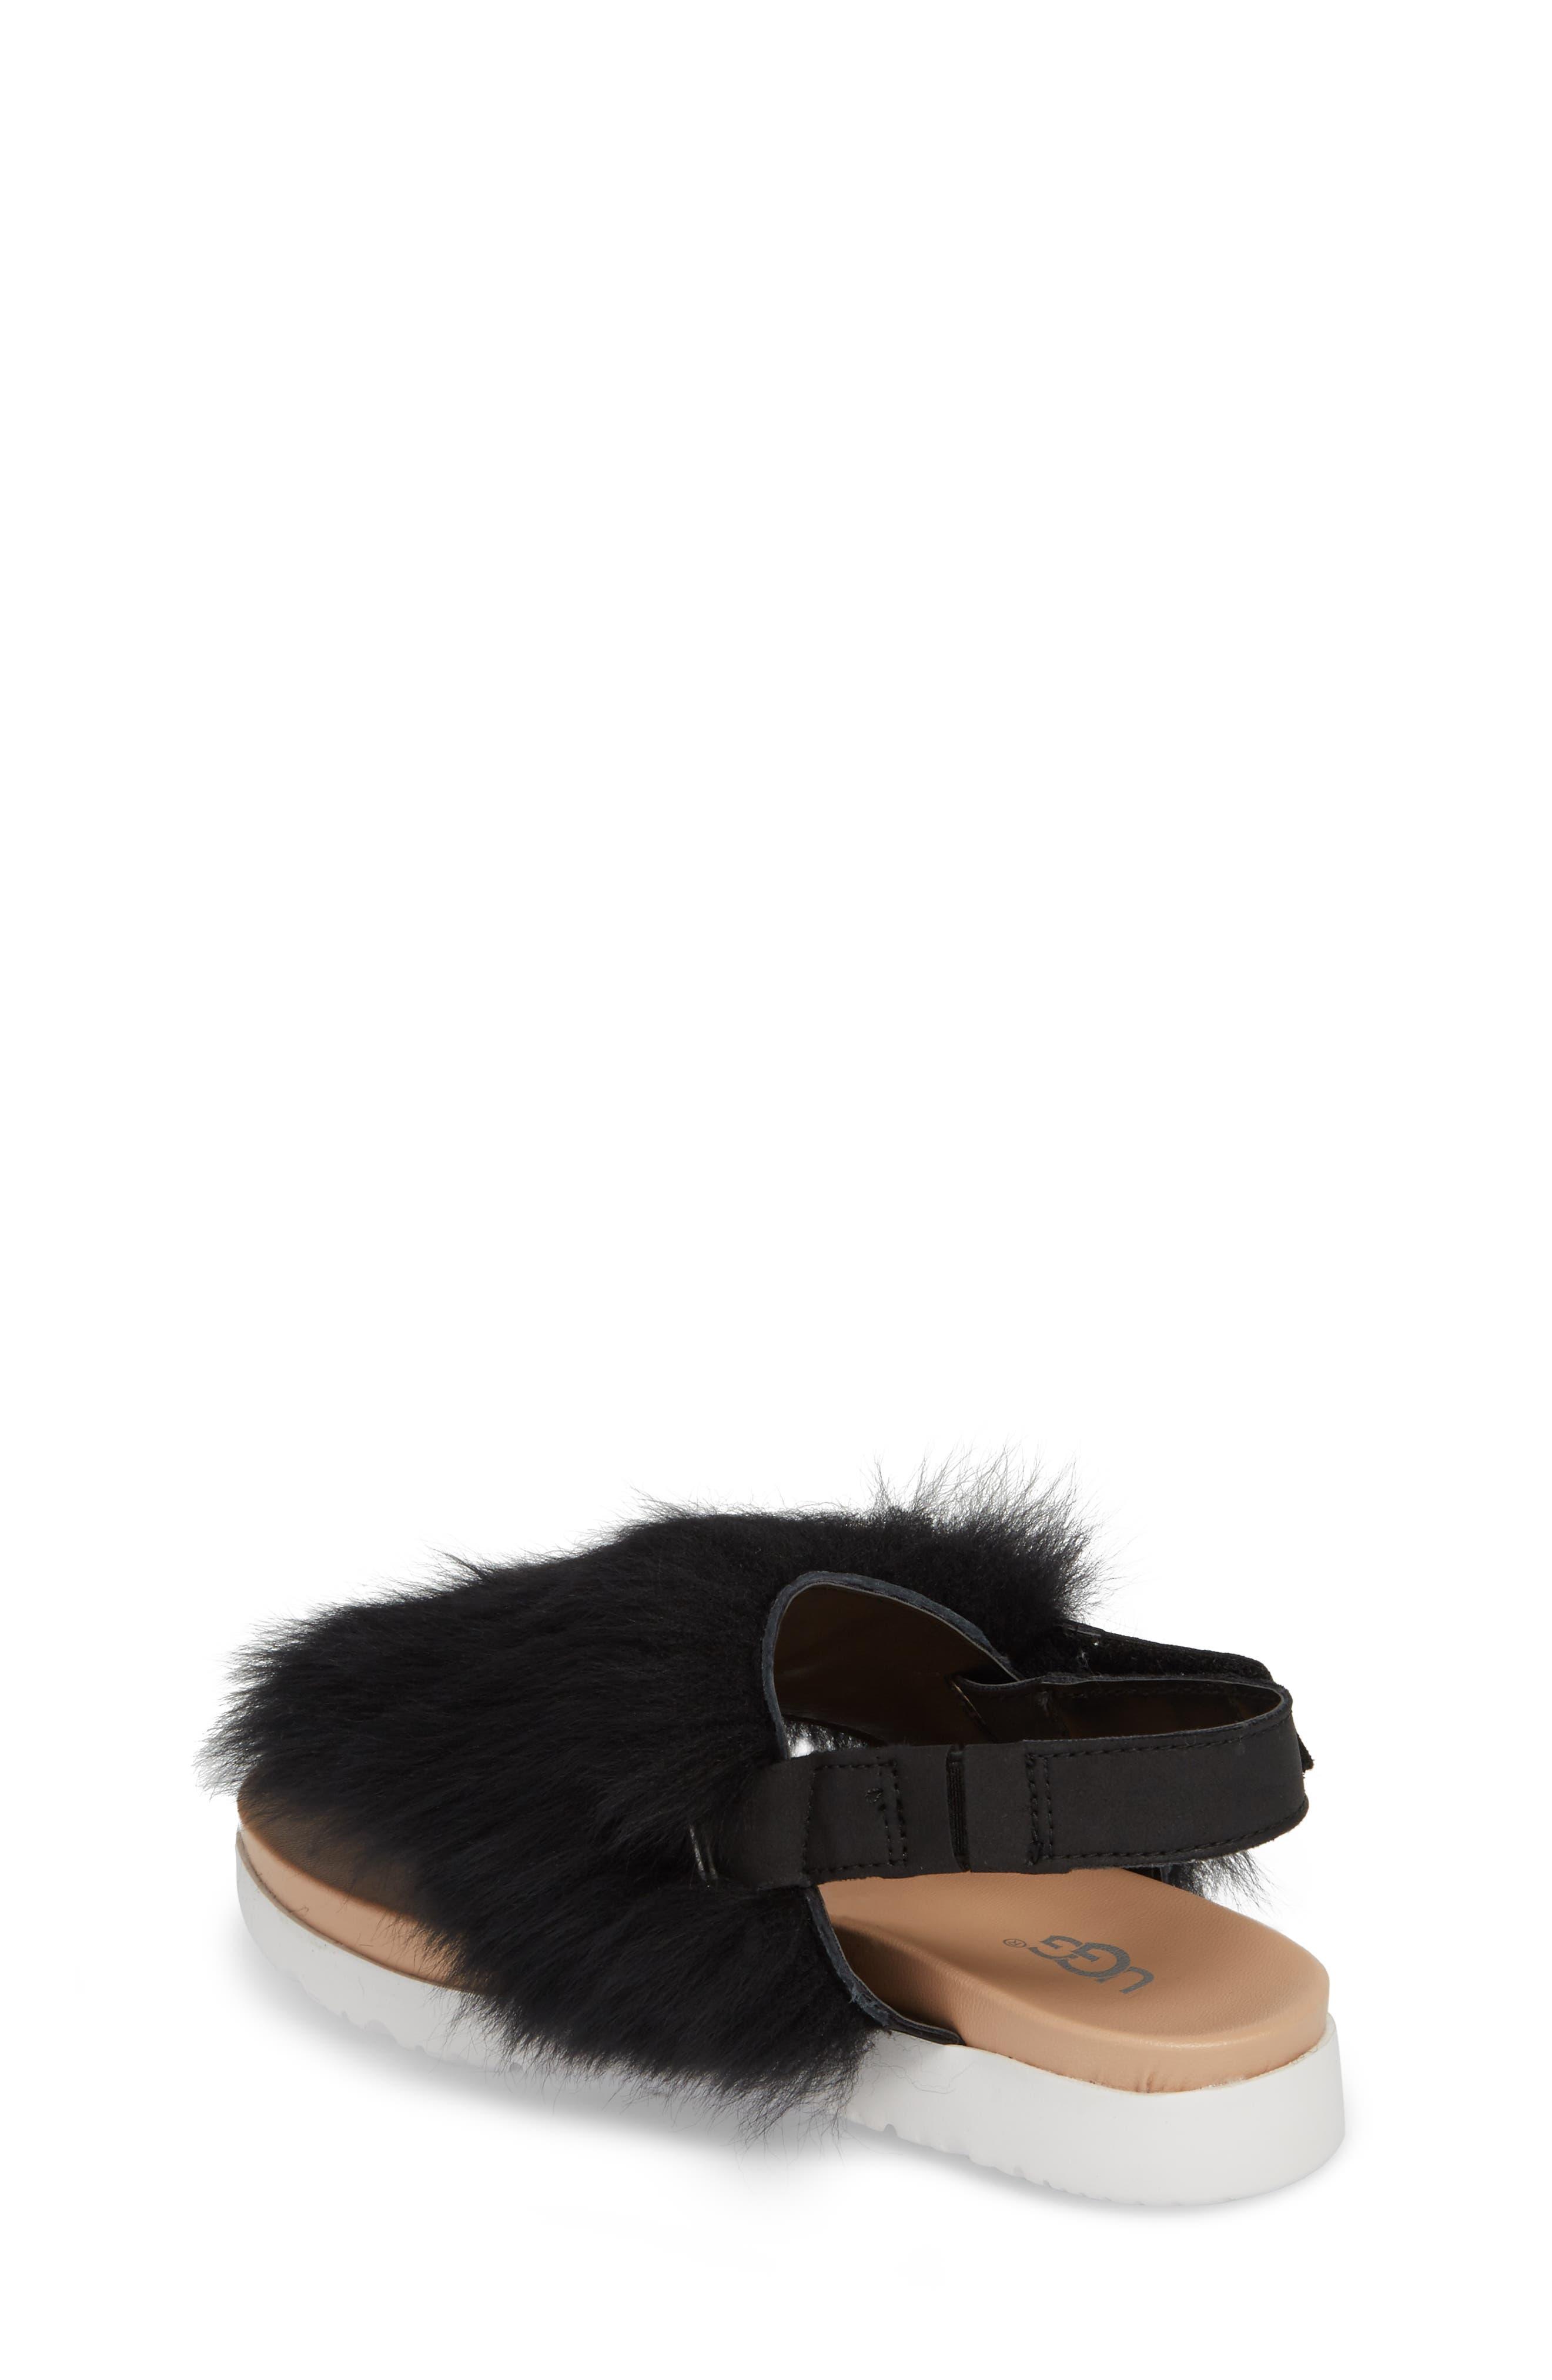 Holly Genuine Shearling Sandal,                             Alternate thumbnail 2, color,                             001